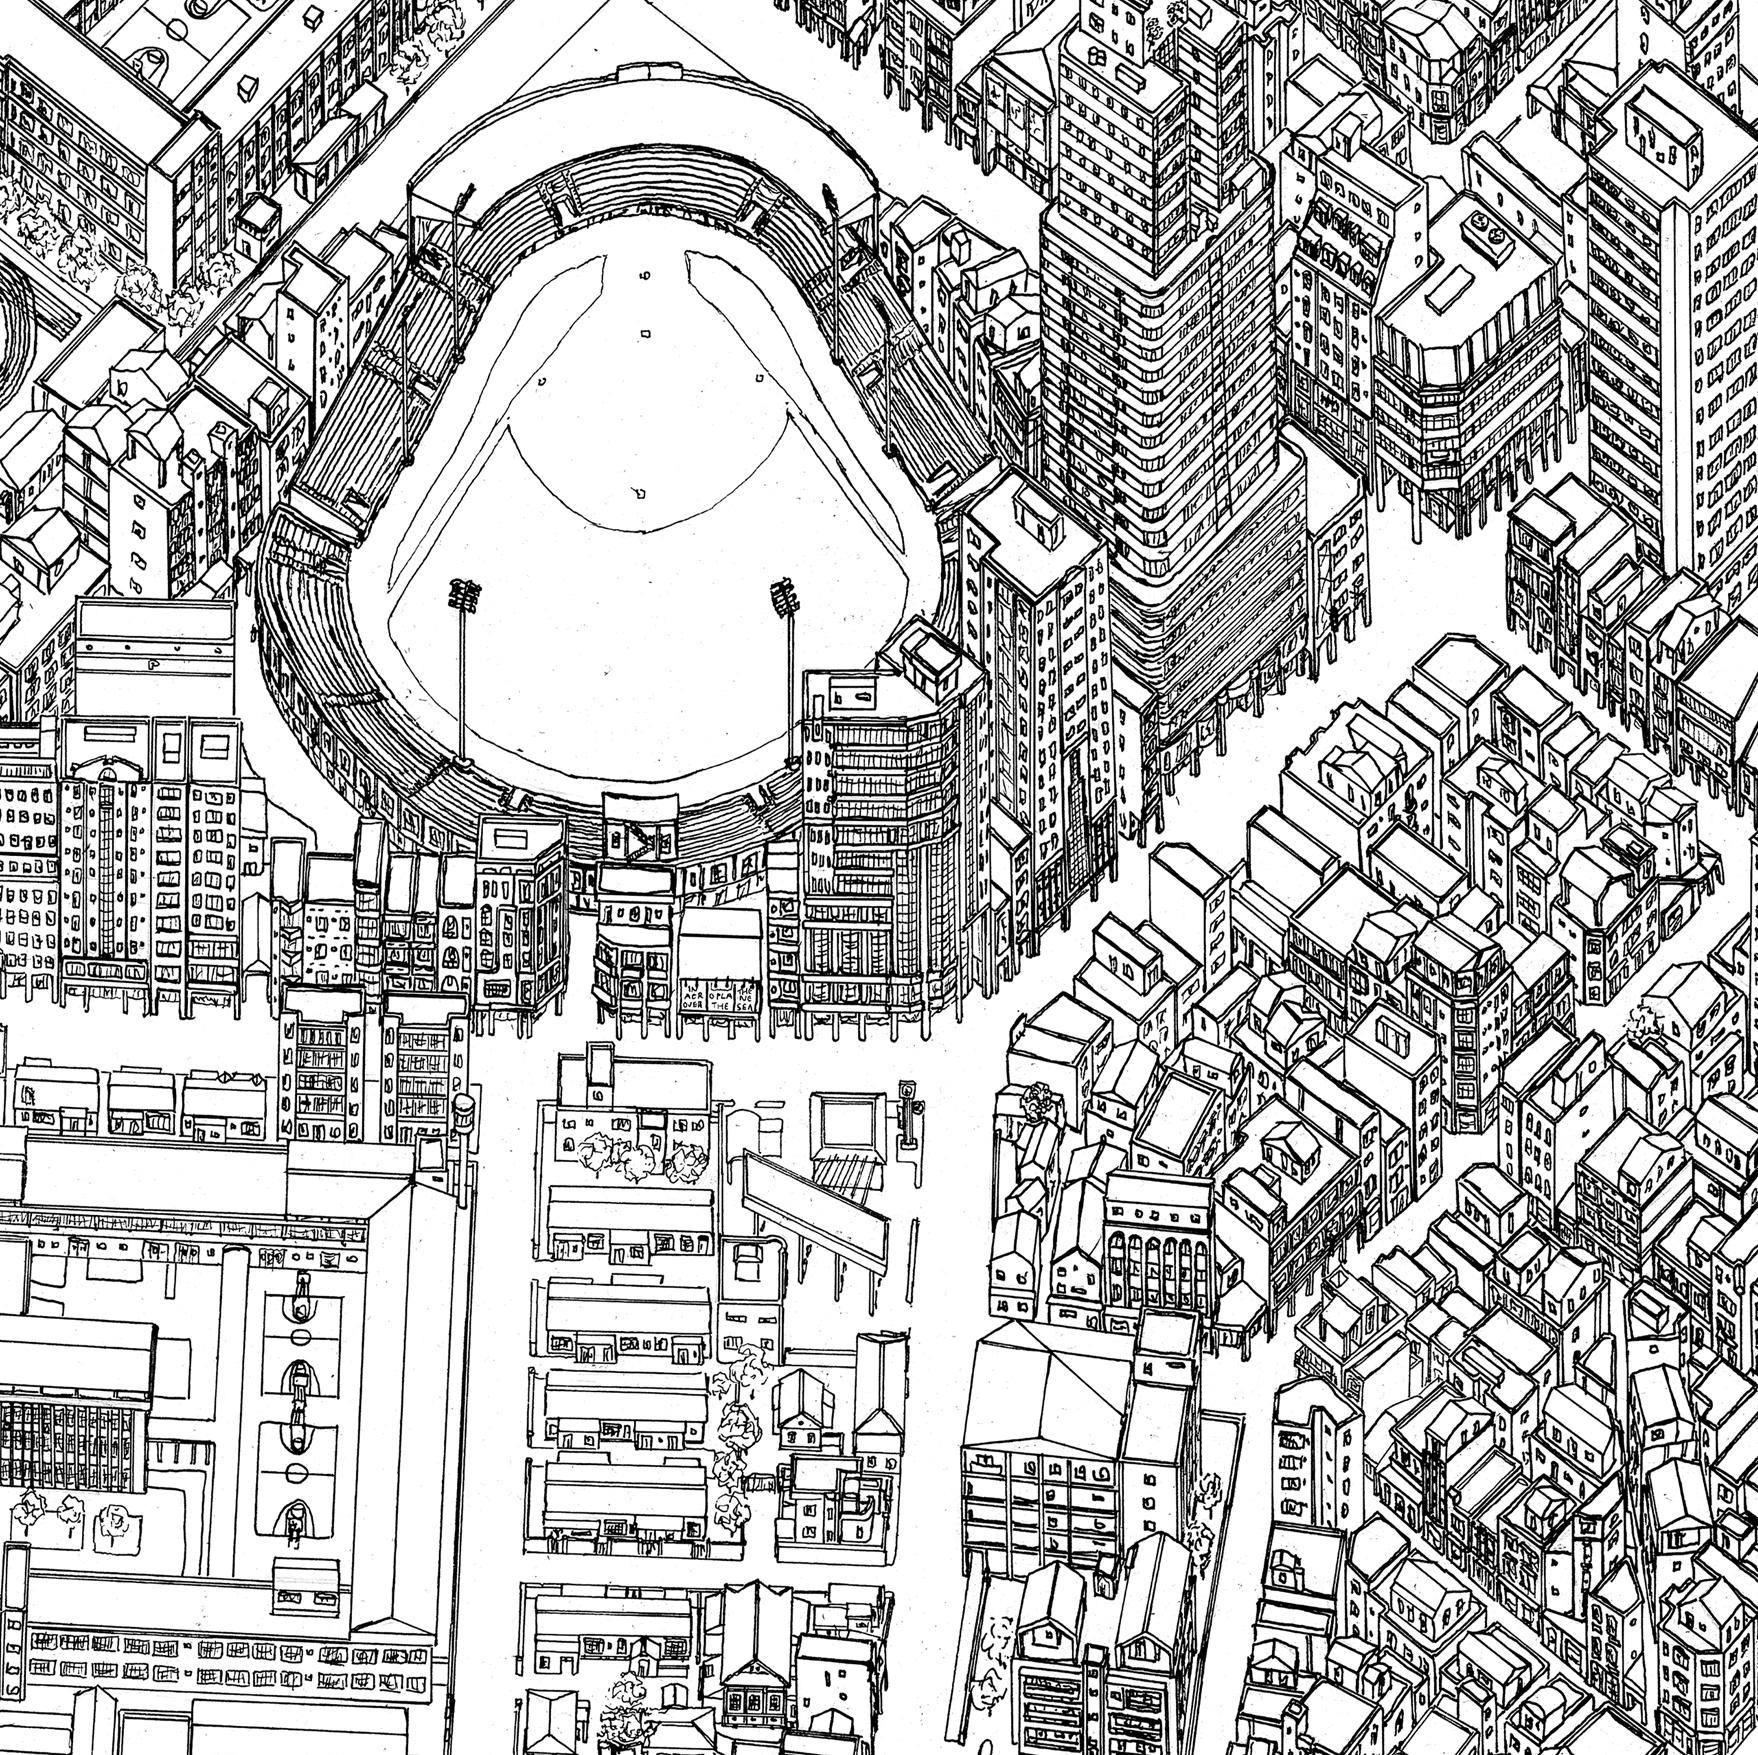 Baseball stadium and prison area